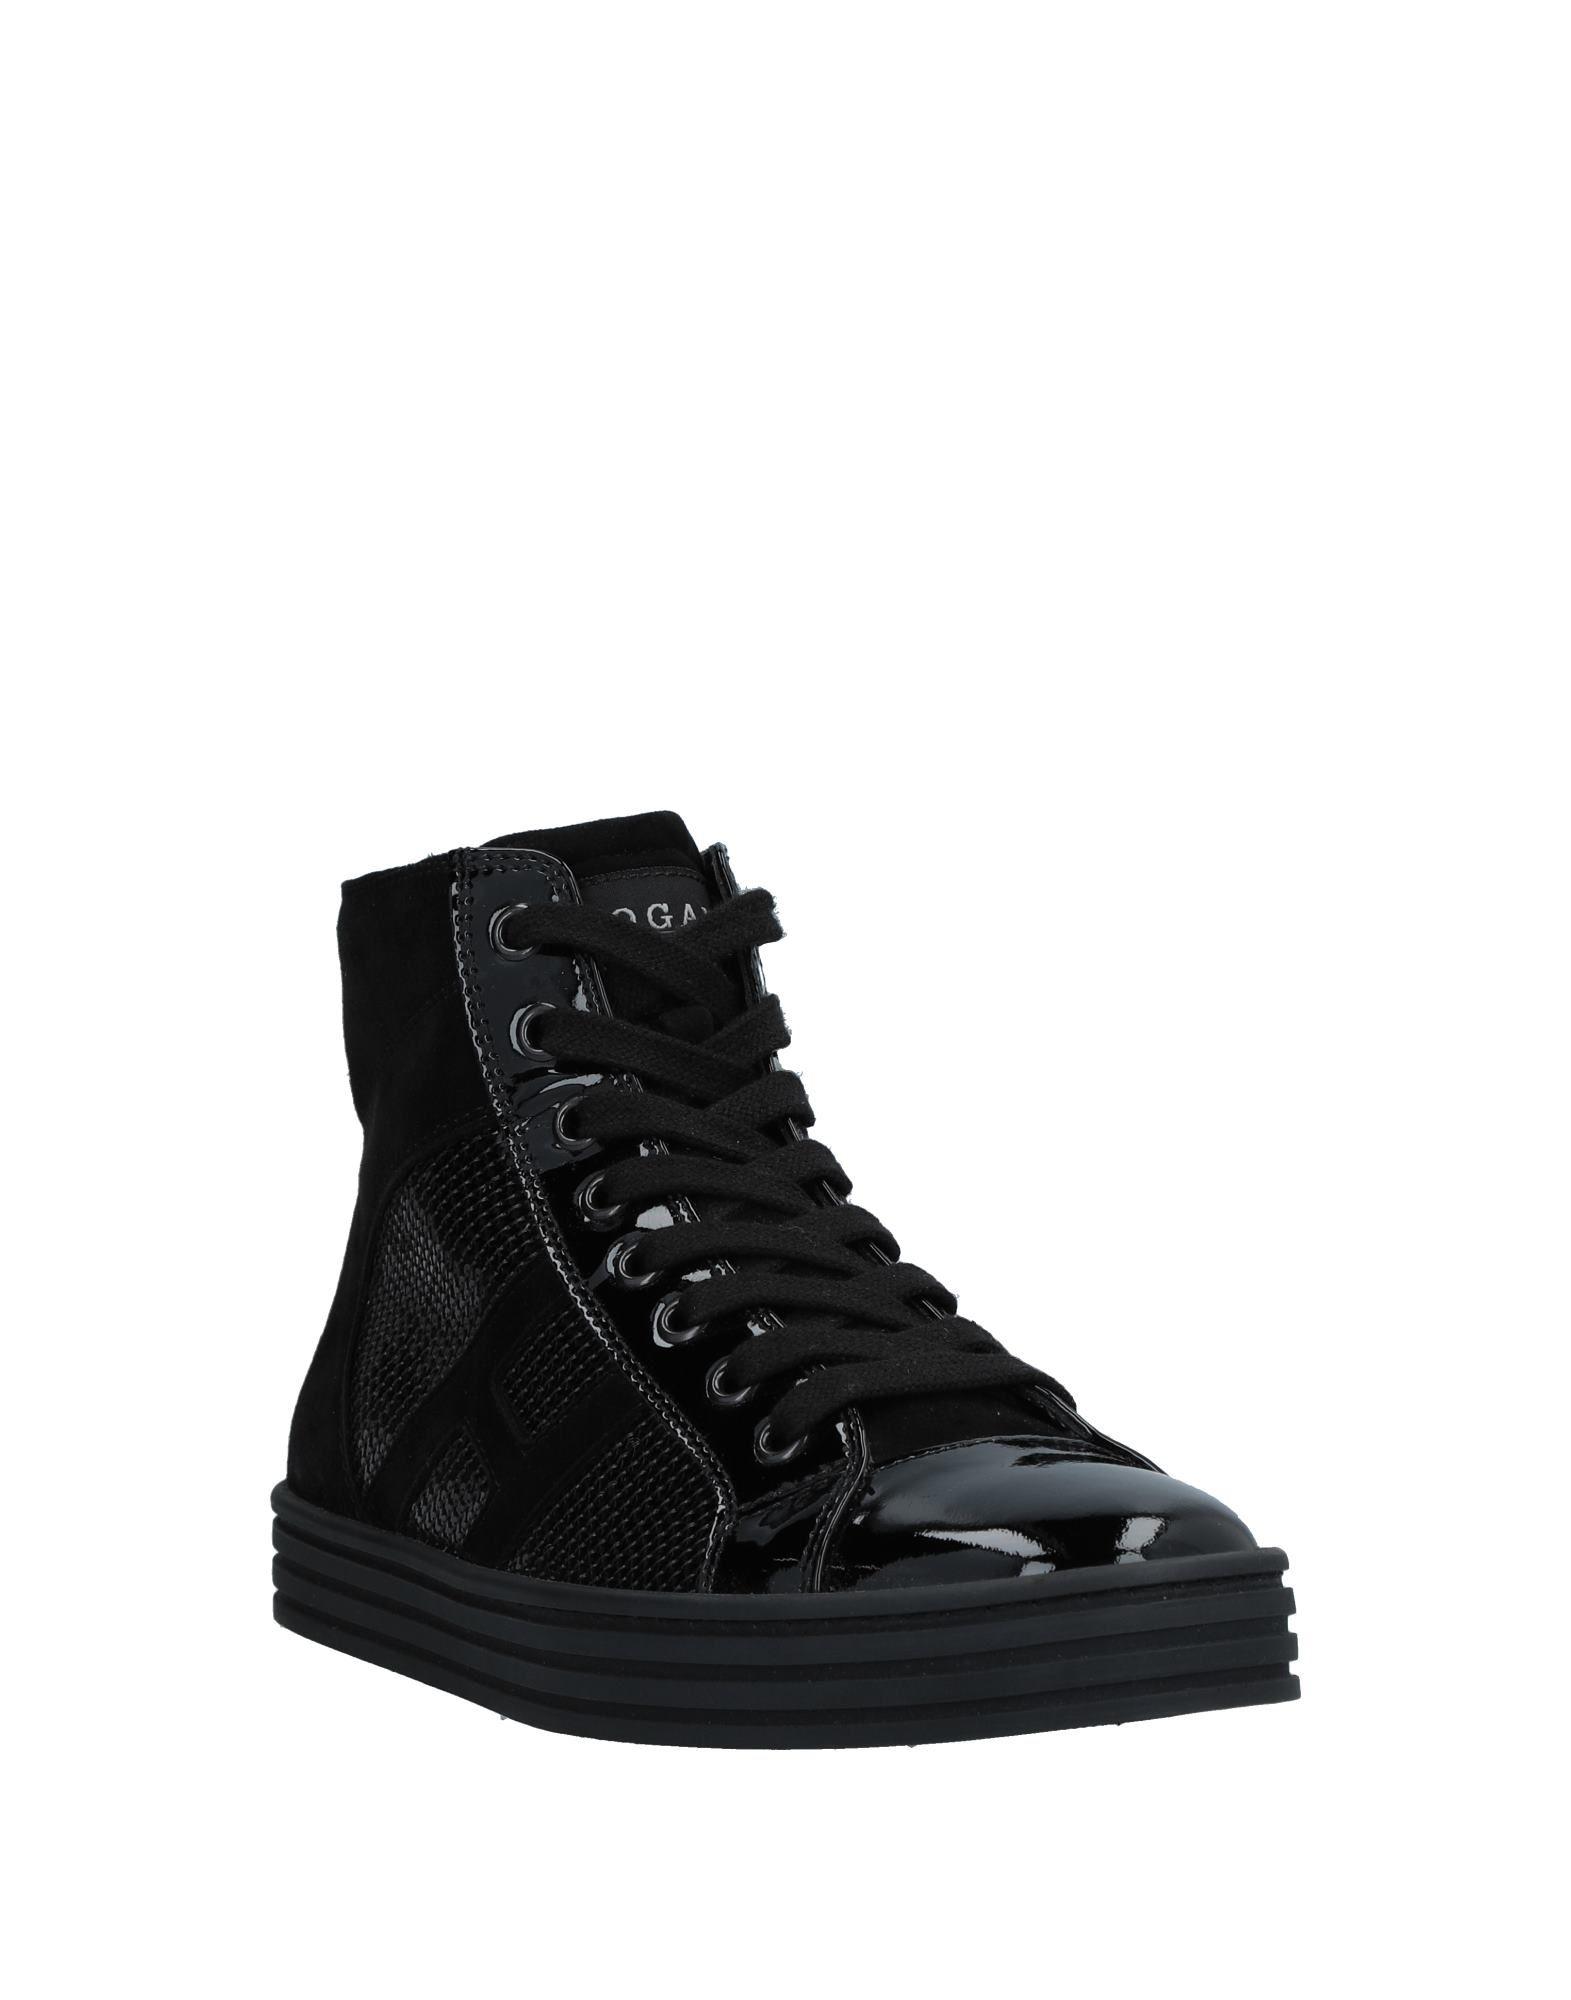 ... Hogan Rebel Sneakers Damen Schuhe 11540107CCGut aussehende  strapazierfähige Schuhe 9b85fc ... d02dbee6f1